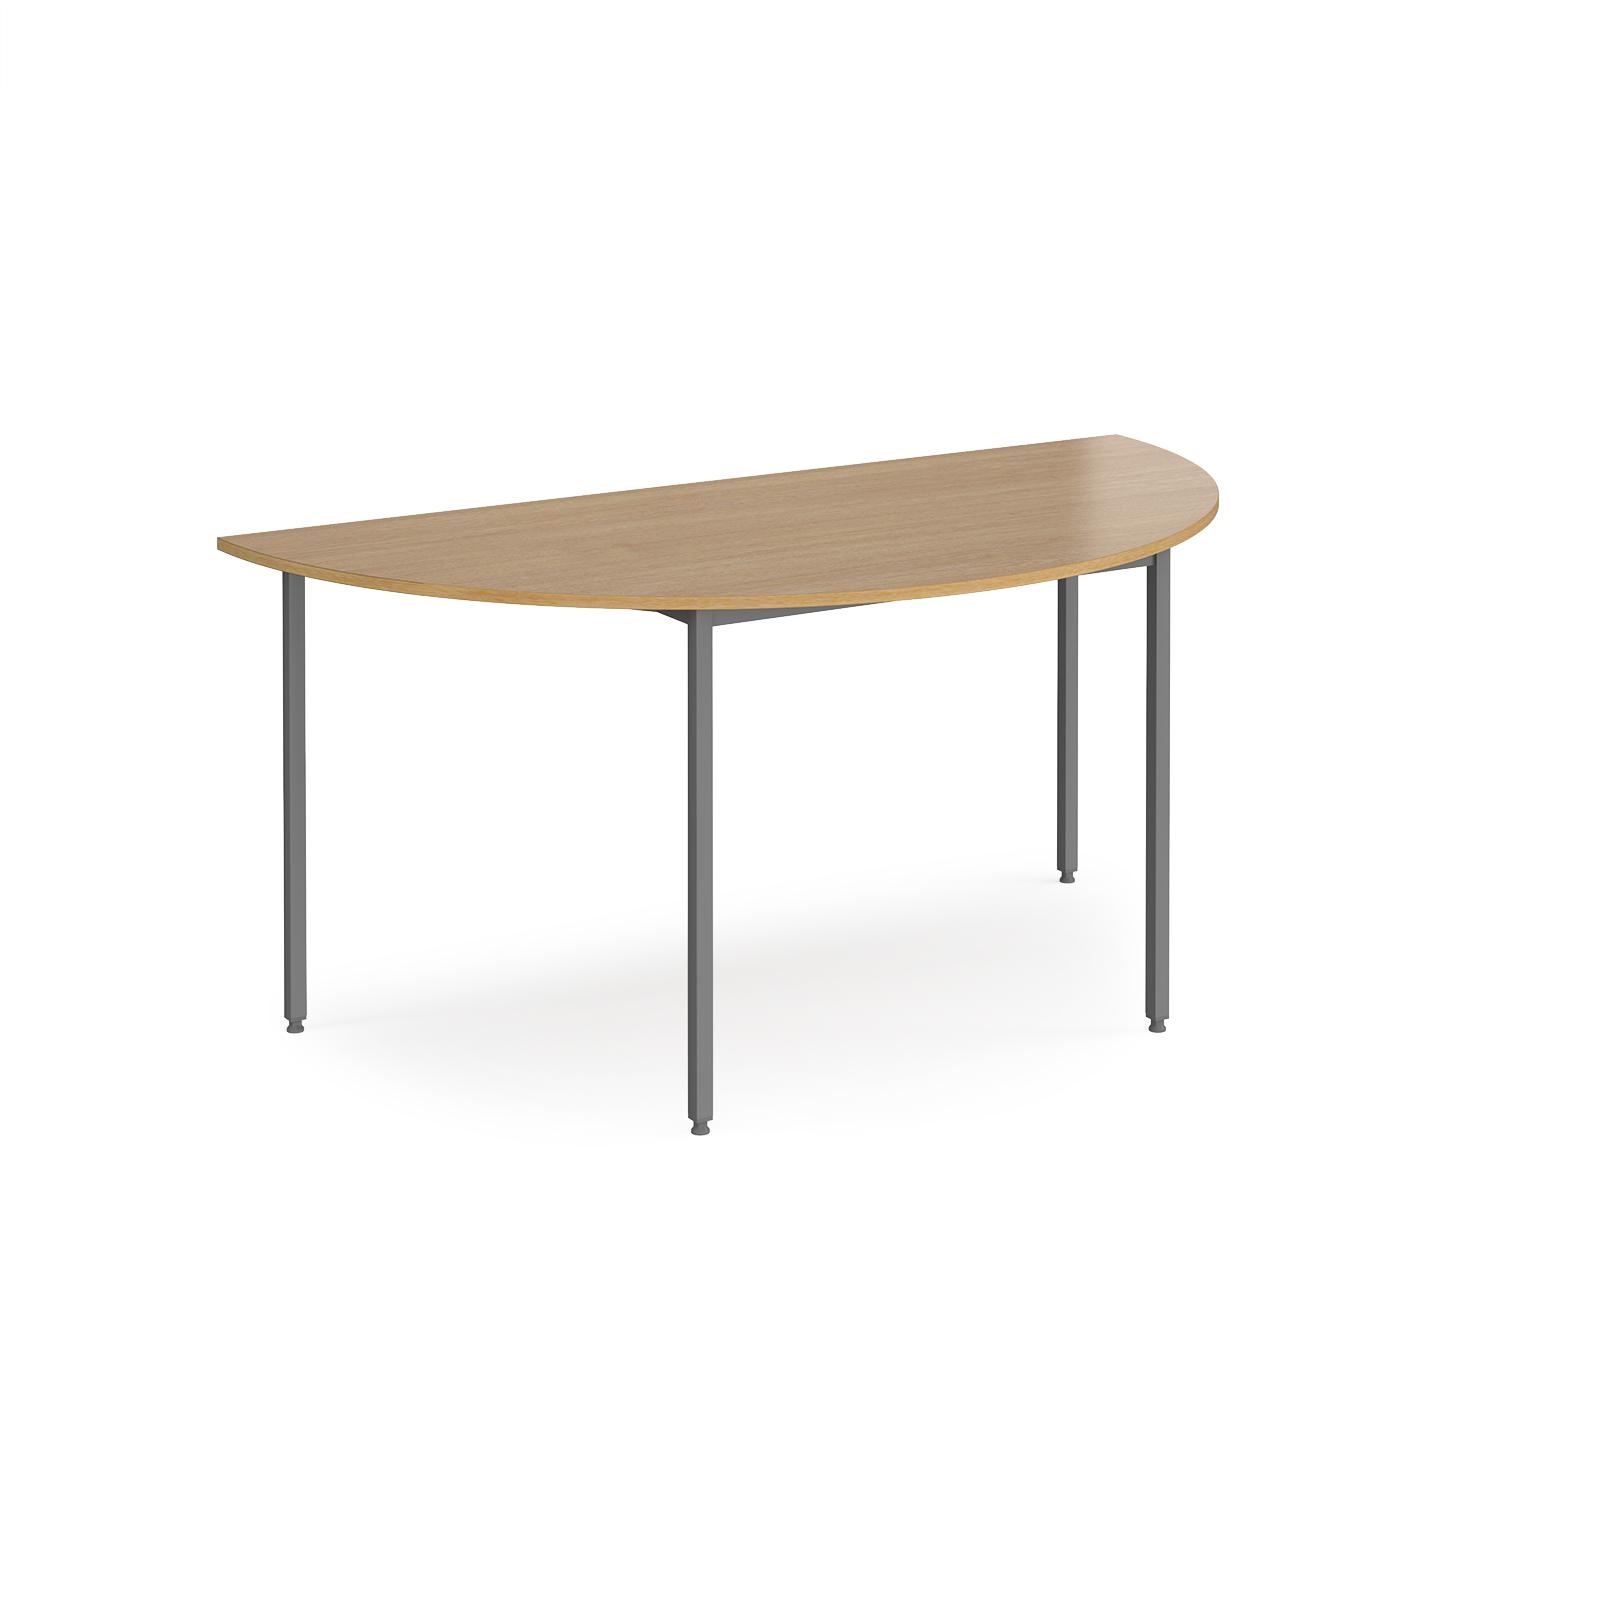 Semi circular flexi table with graphite frame 1600mm x 800mm - oak